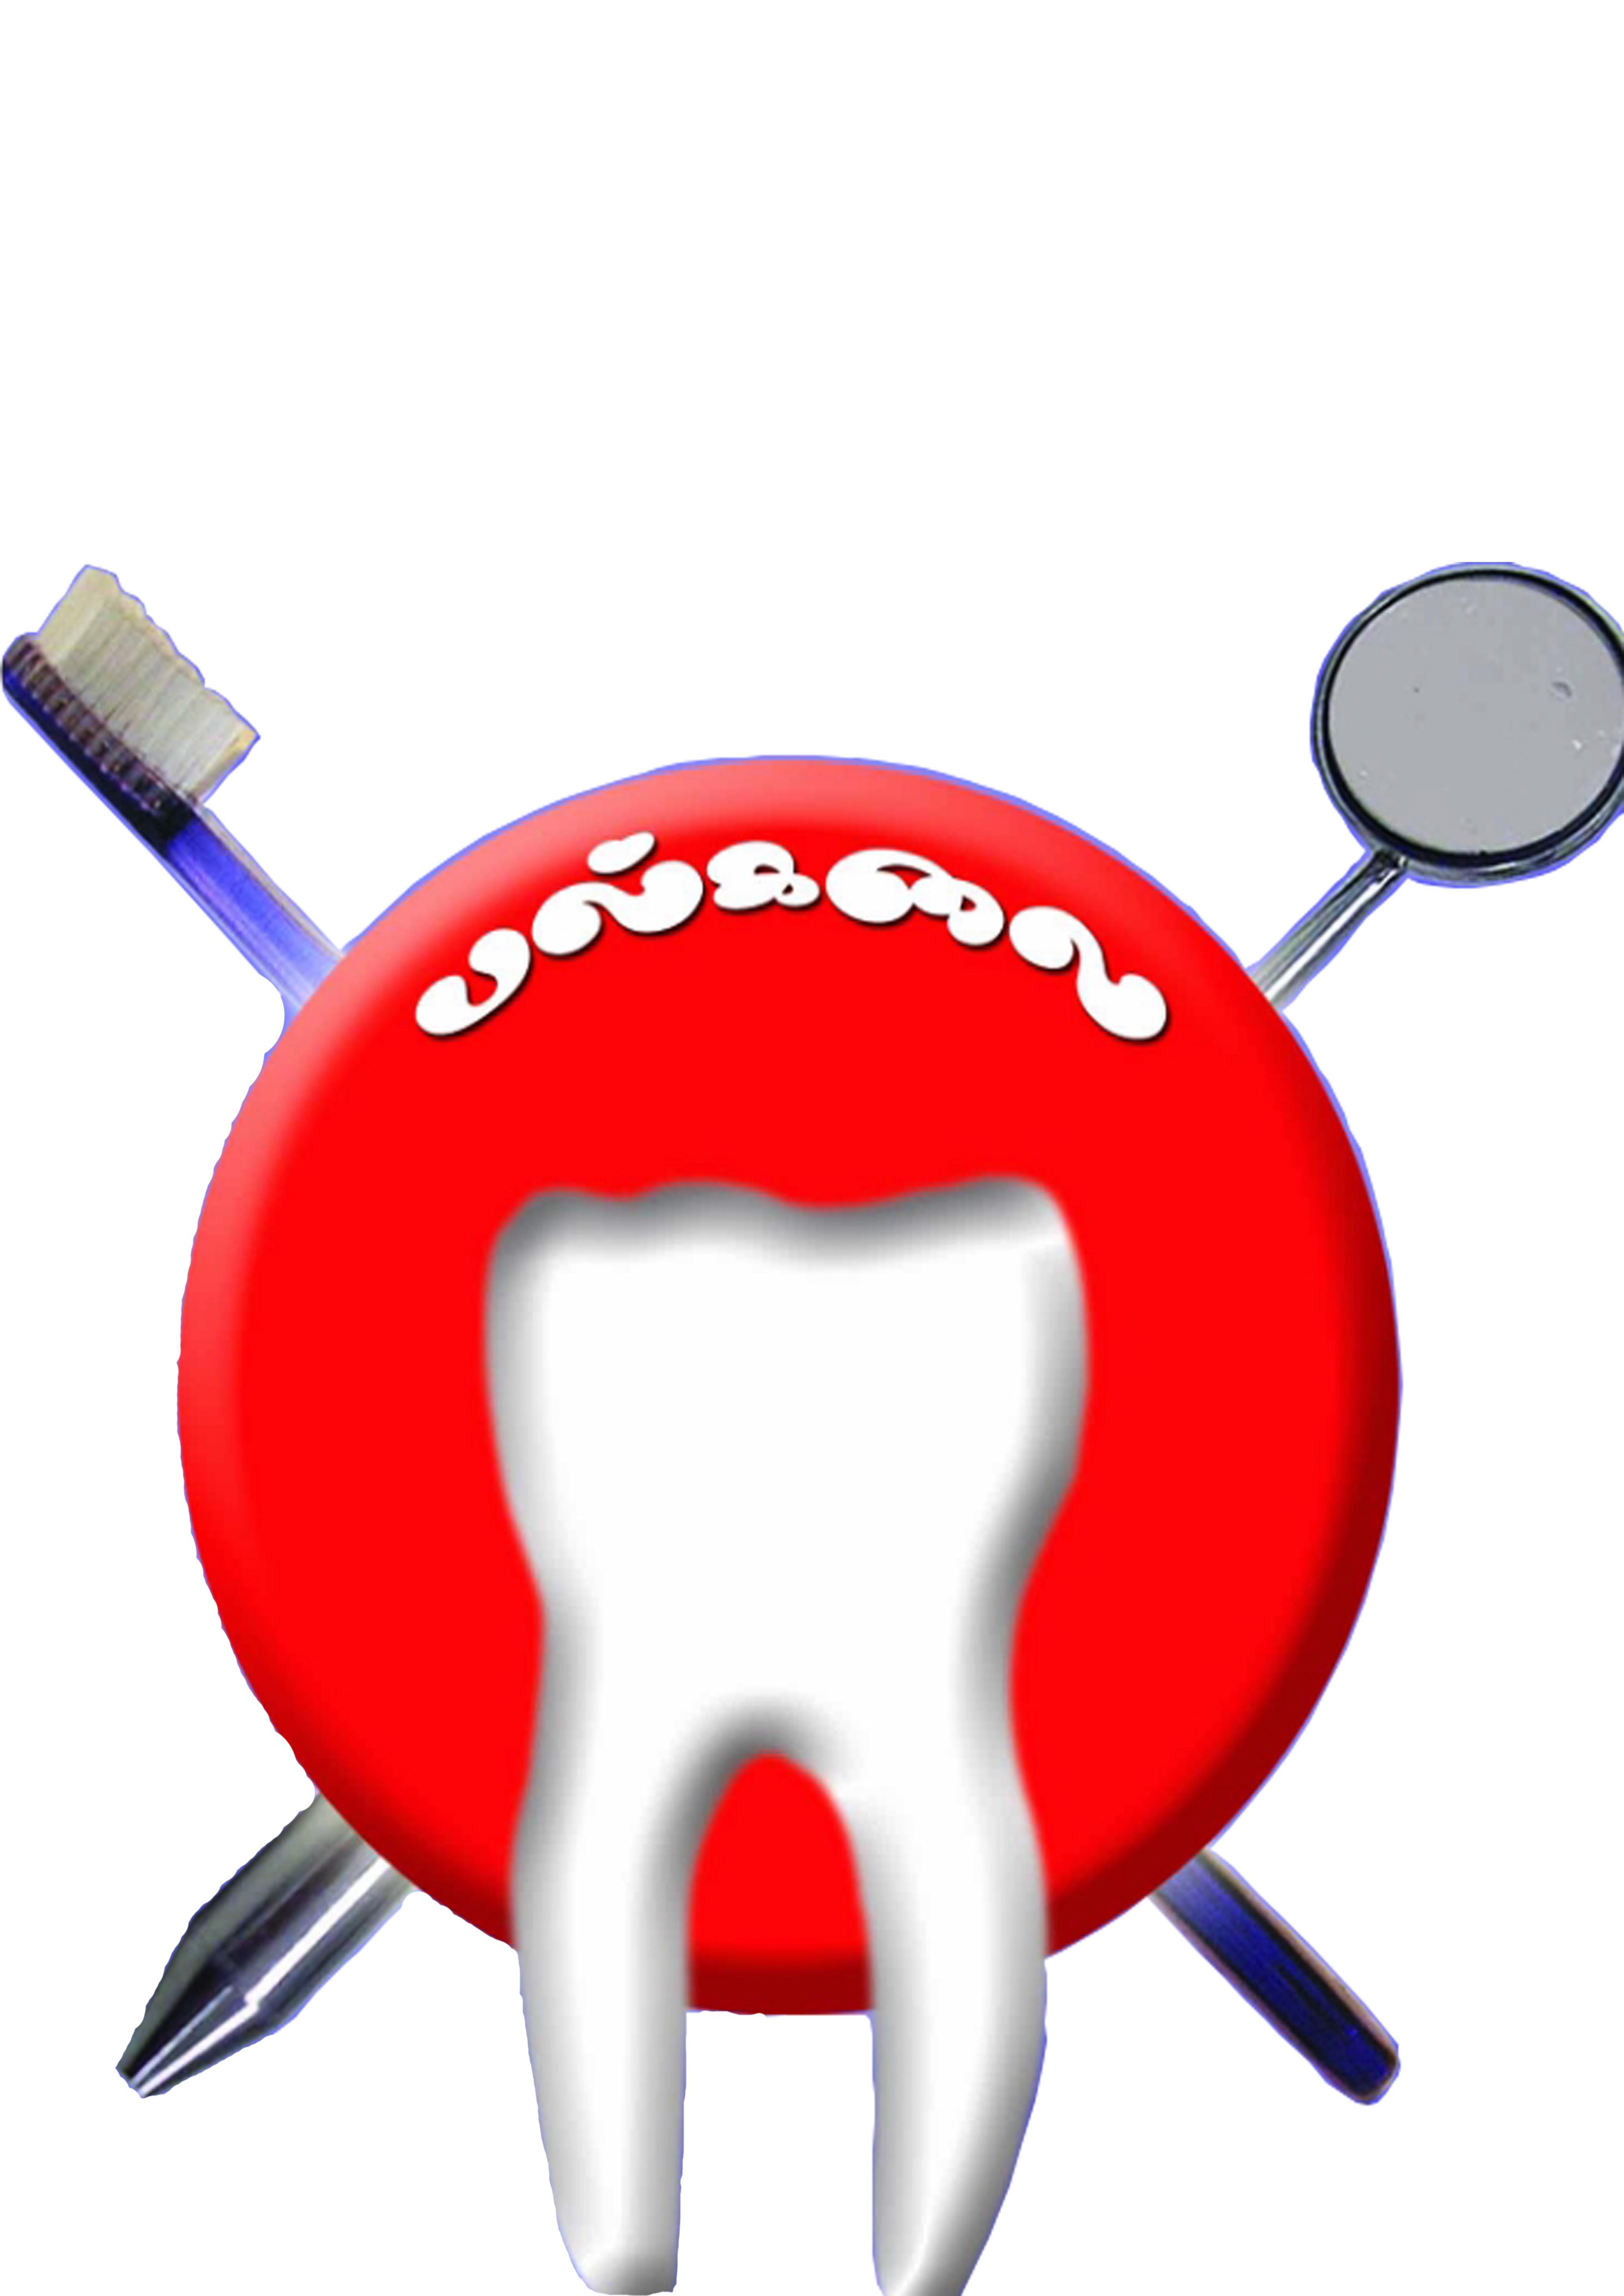 Palkalai Multispeciality Dental Clinic